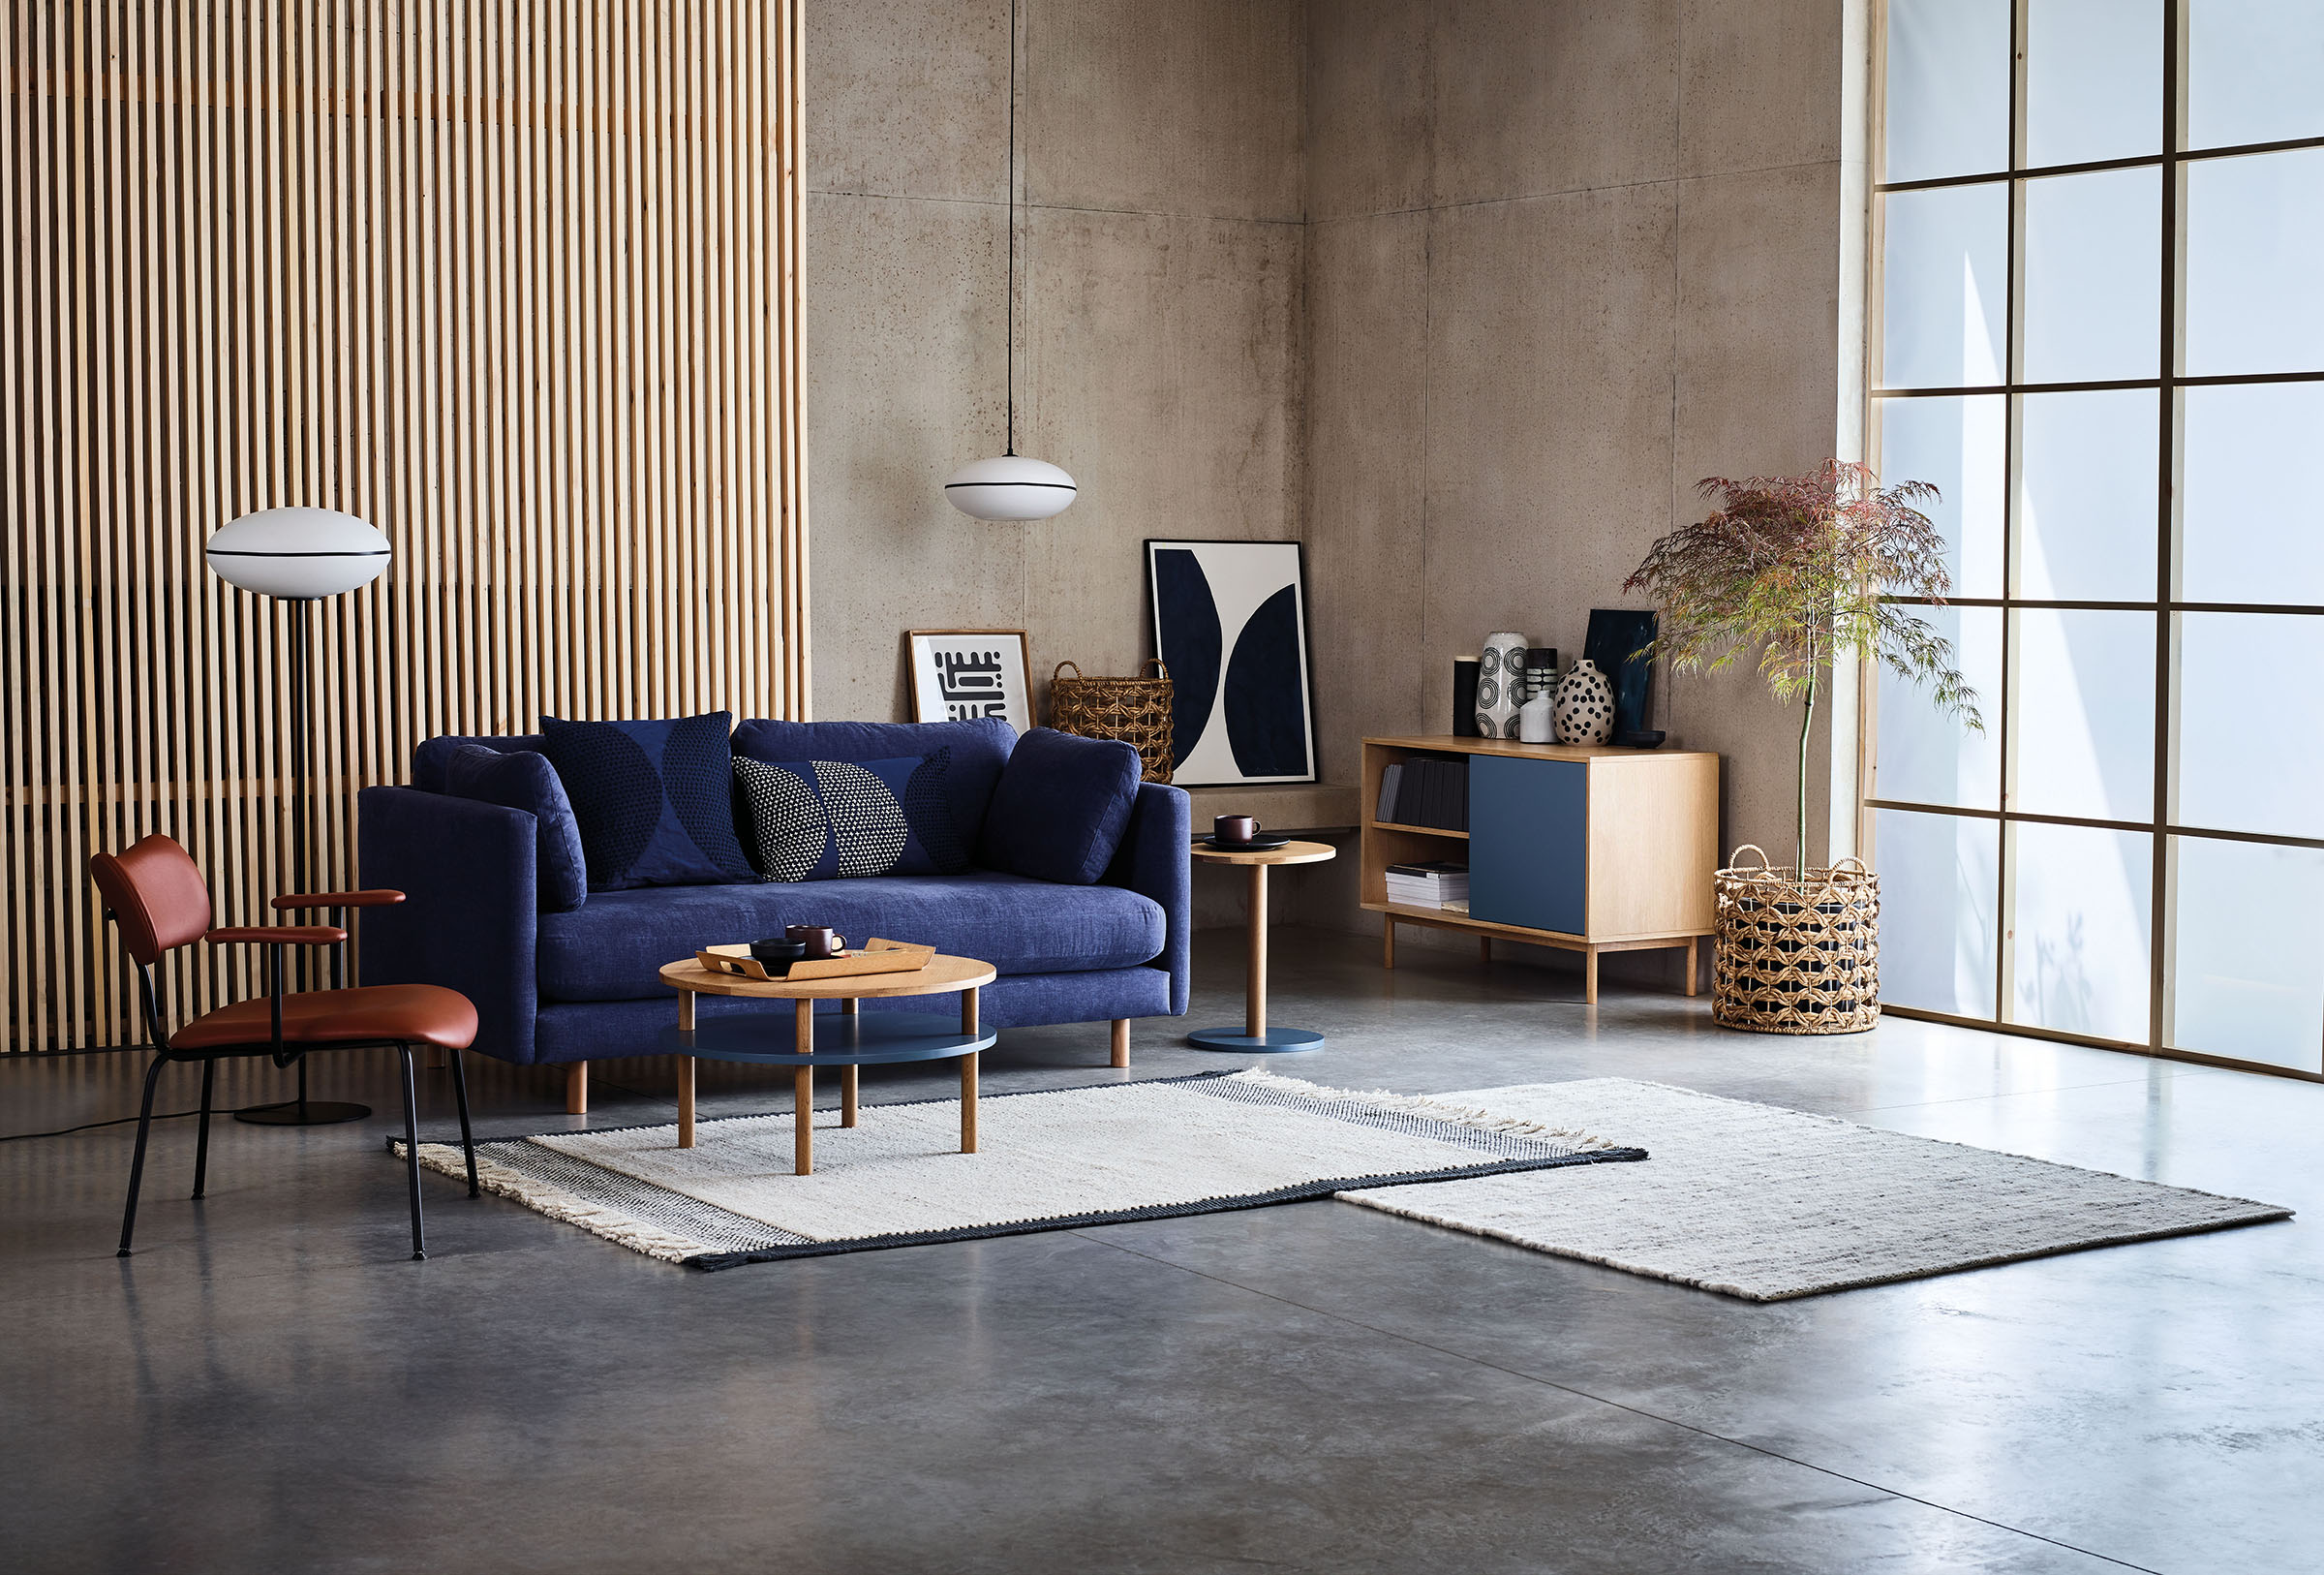 Japandi Japanese Design Meets Scandinavian Interiors